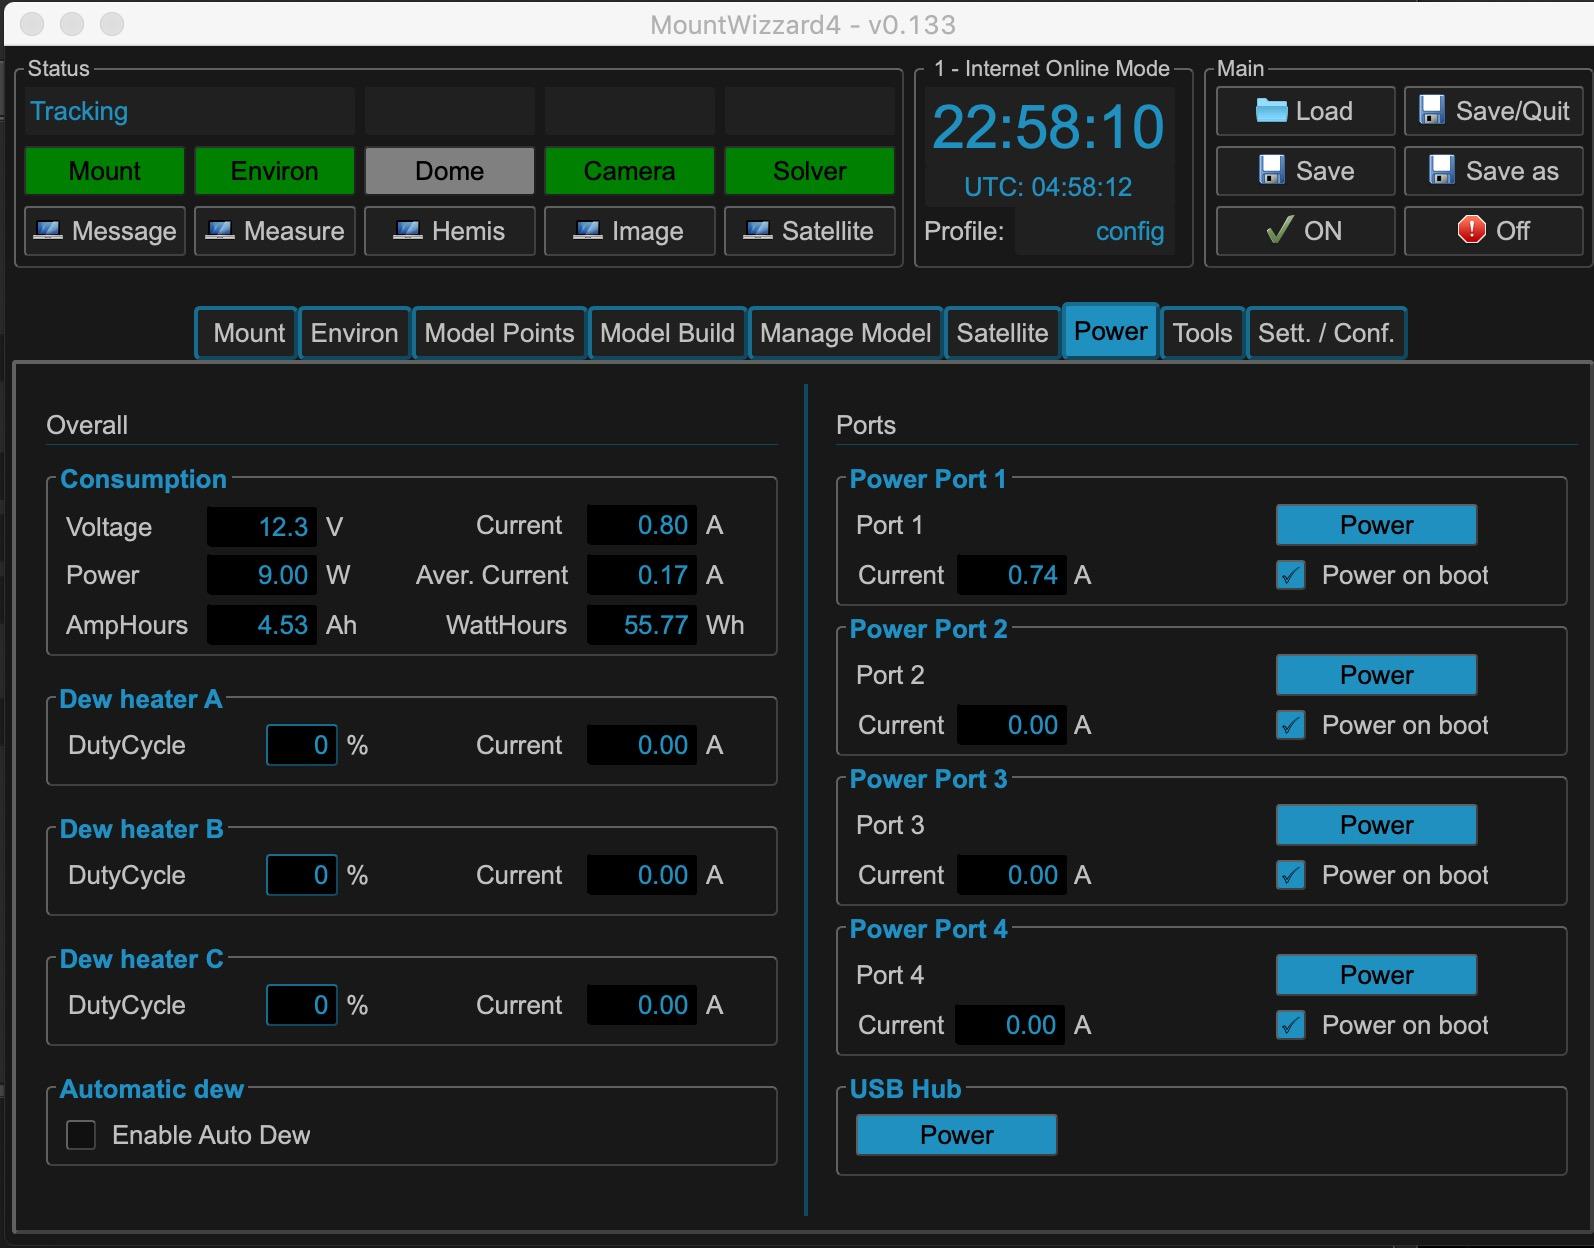 ScreenShot2019-11-11at10.58.11PM.jpg